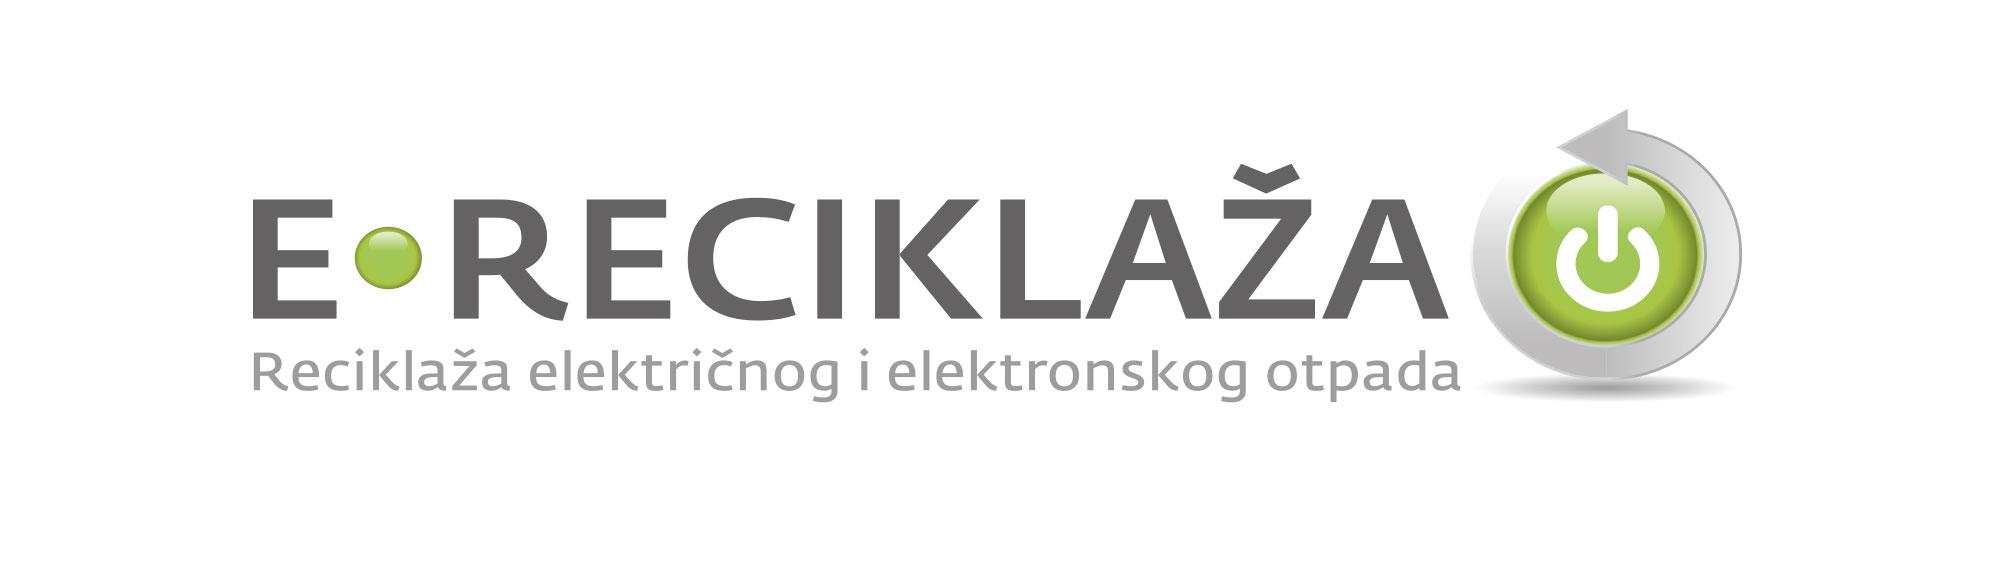 e-reciklaza logo